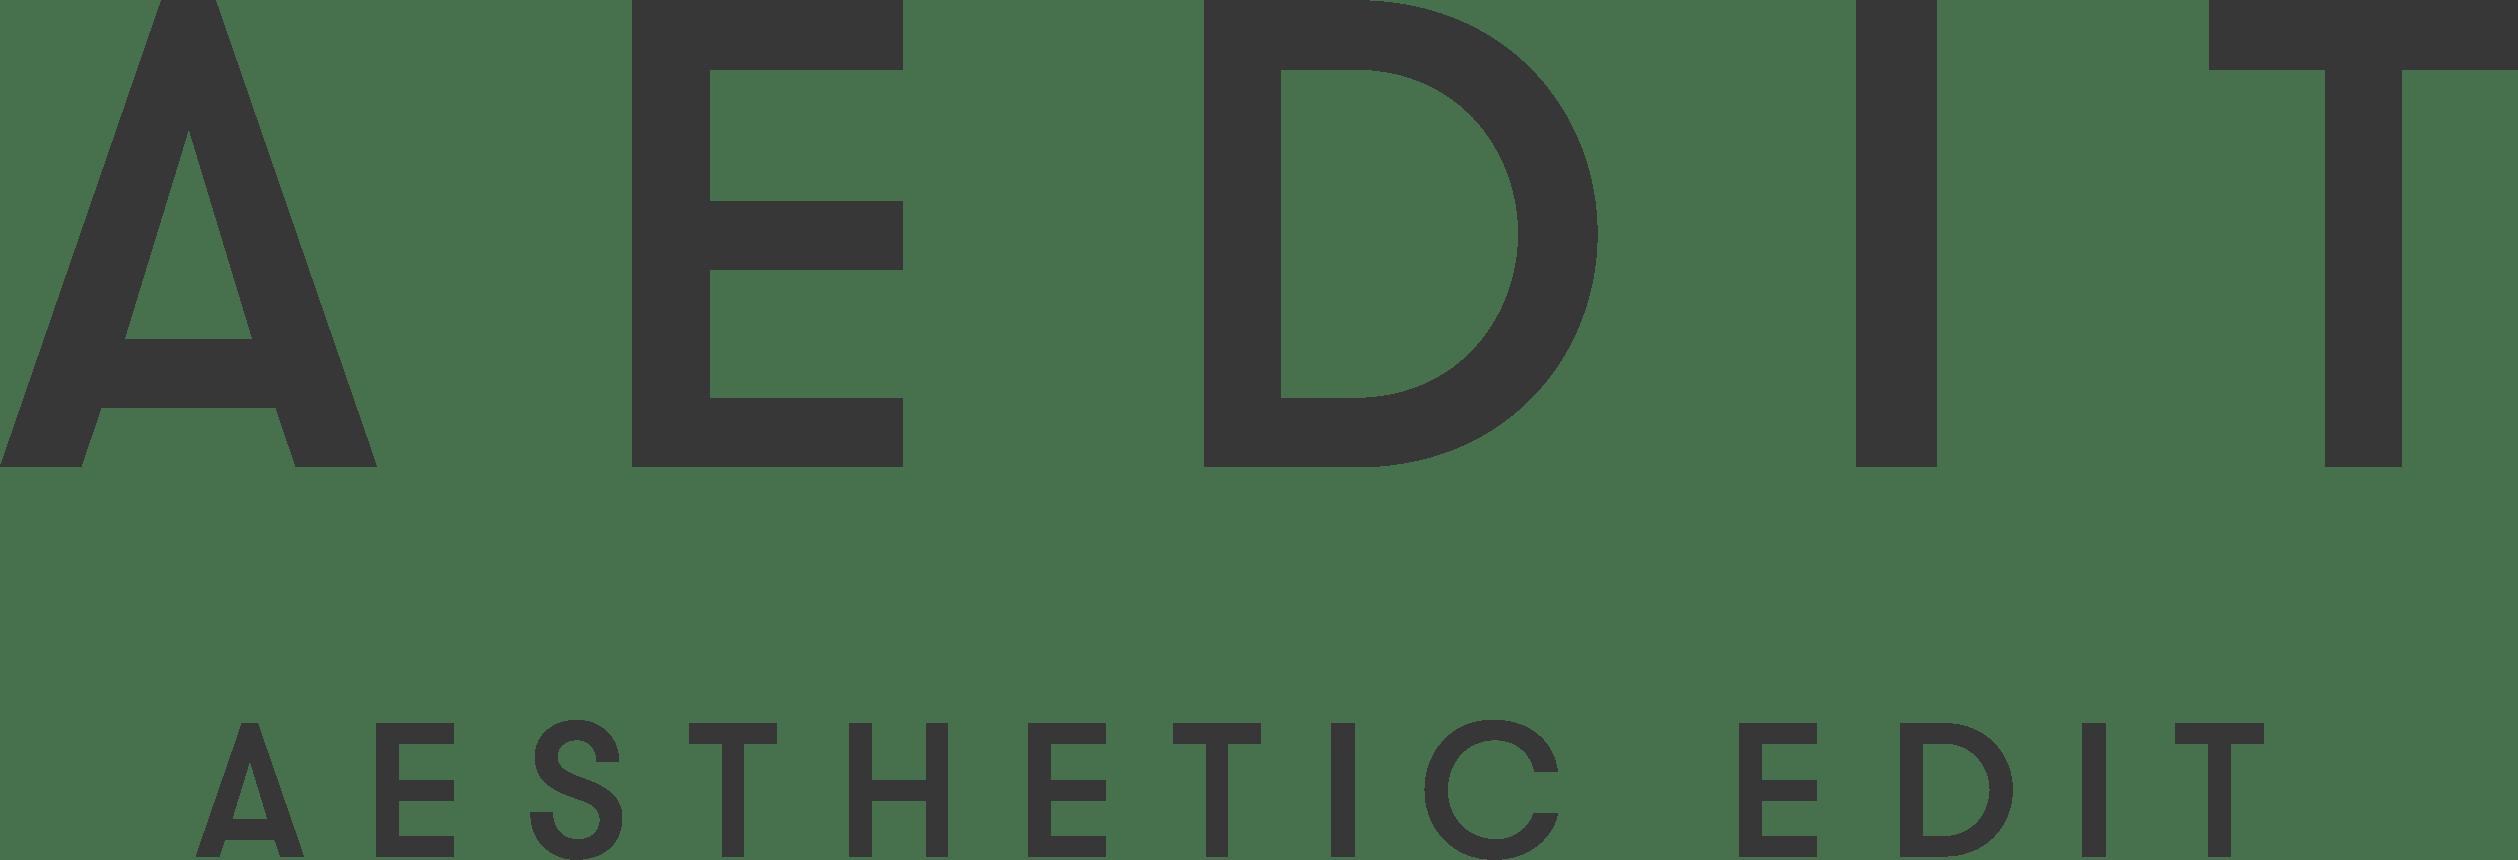 Aedit logo